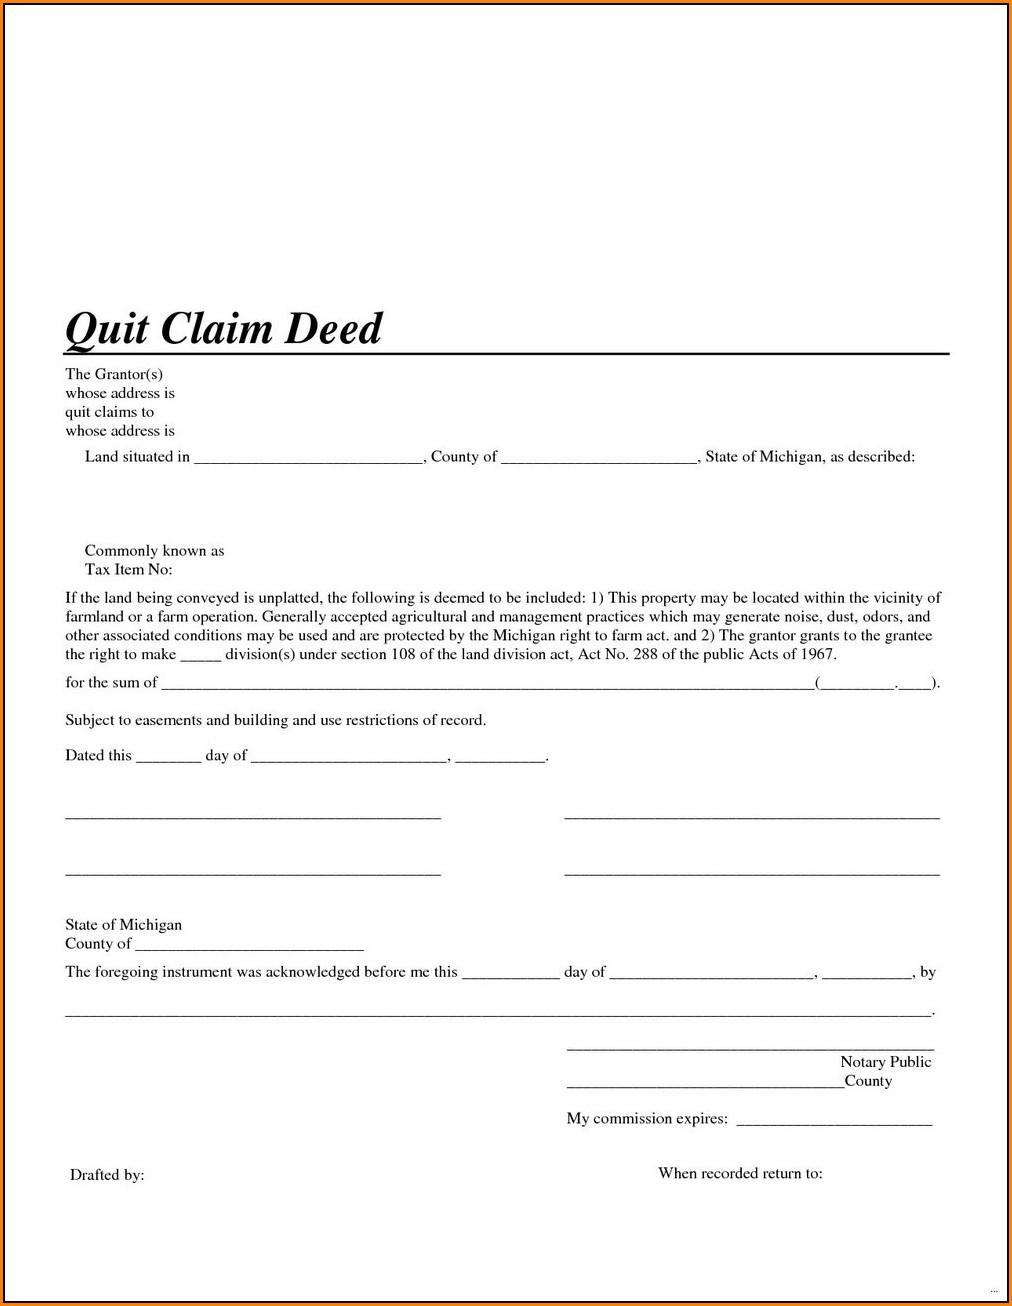 Quick Claim Deed Form Michigan